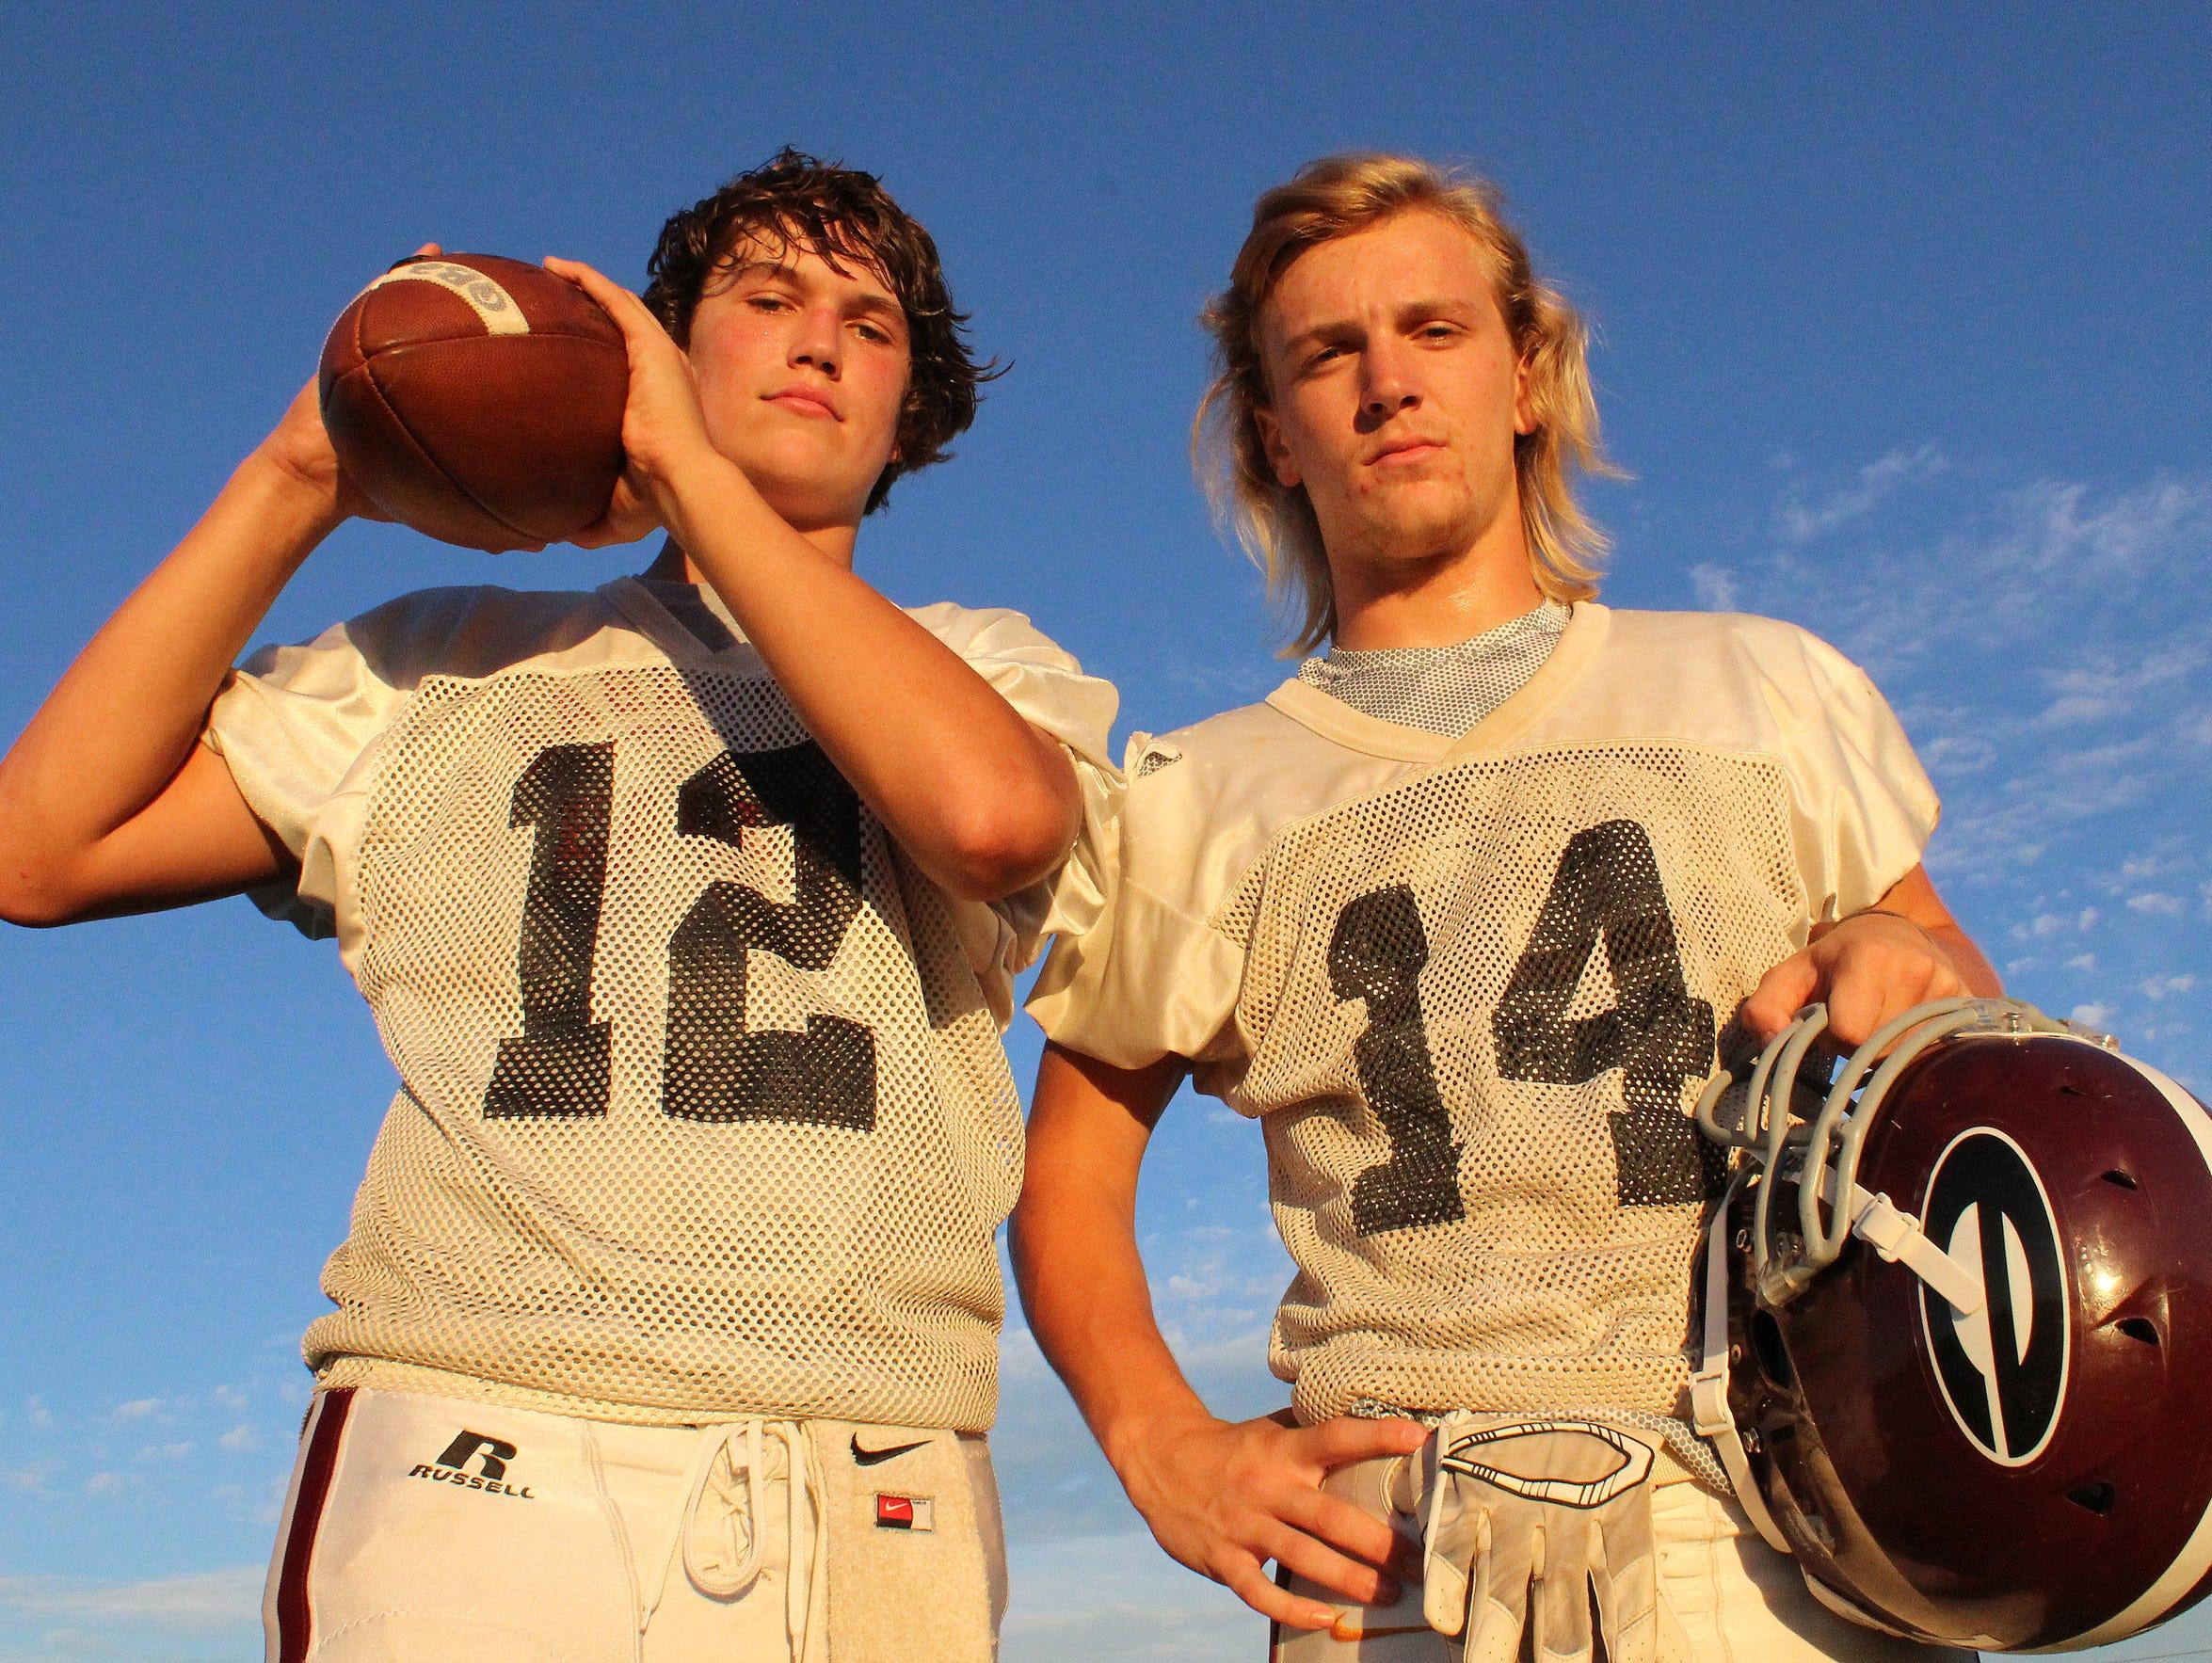 Eagleville freshman Ethan Cobb and sophomore Graham